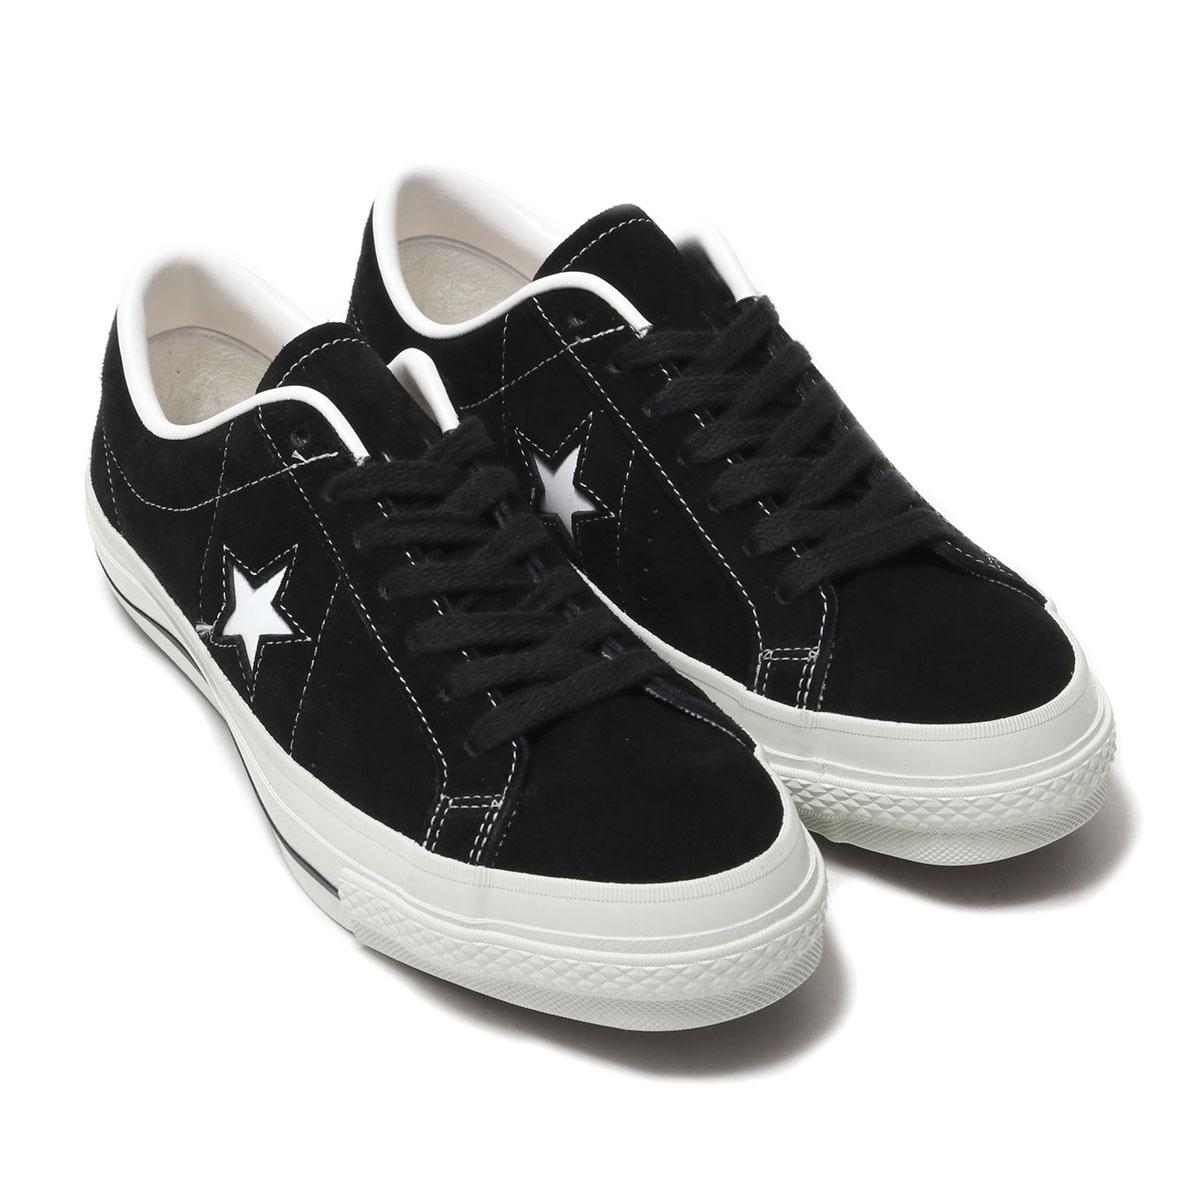 CONVERSE ONE STAR J SUEDE (コンバース ワンスター J スエード)ブラック【メンズ レディース スニーカー】19SS-S